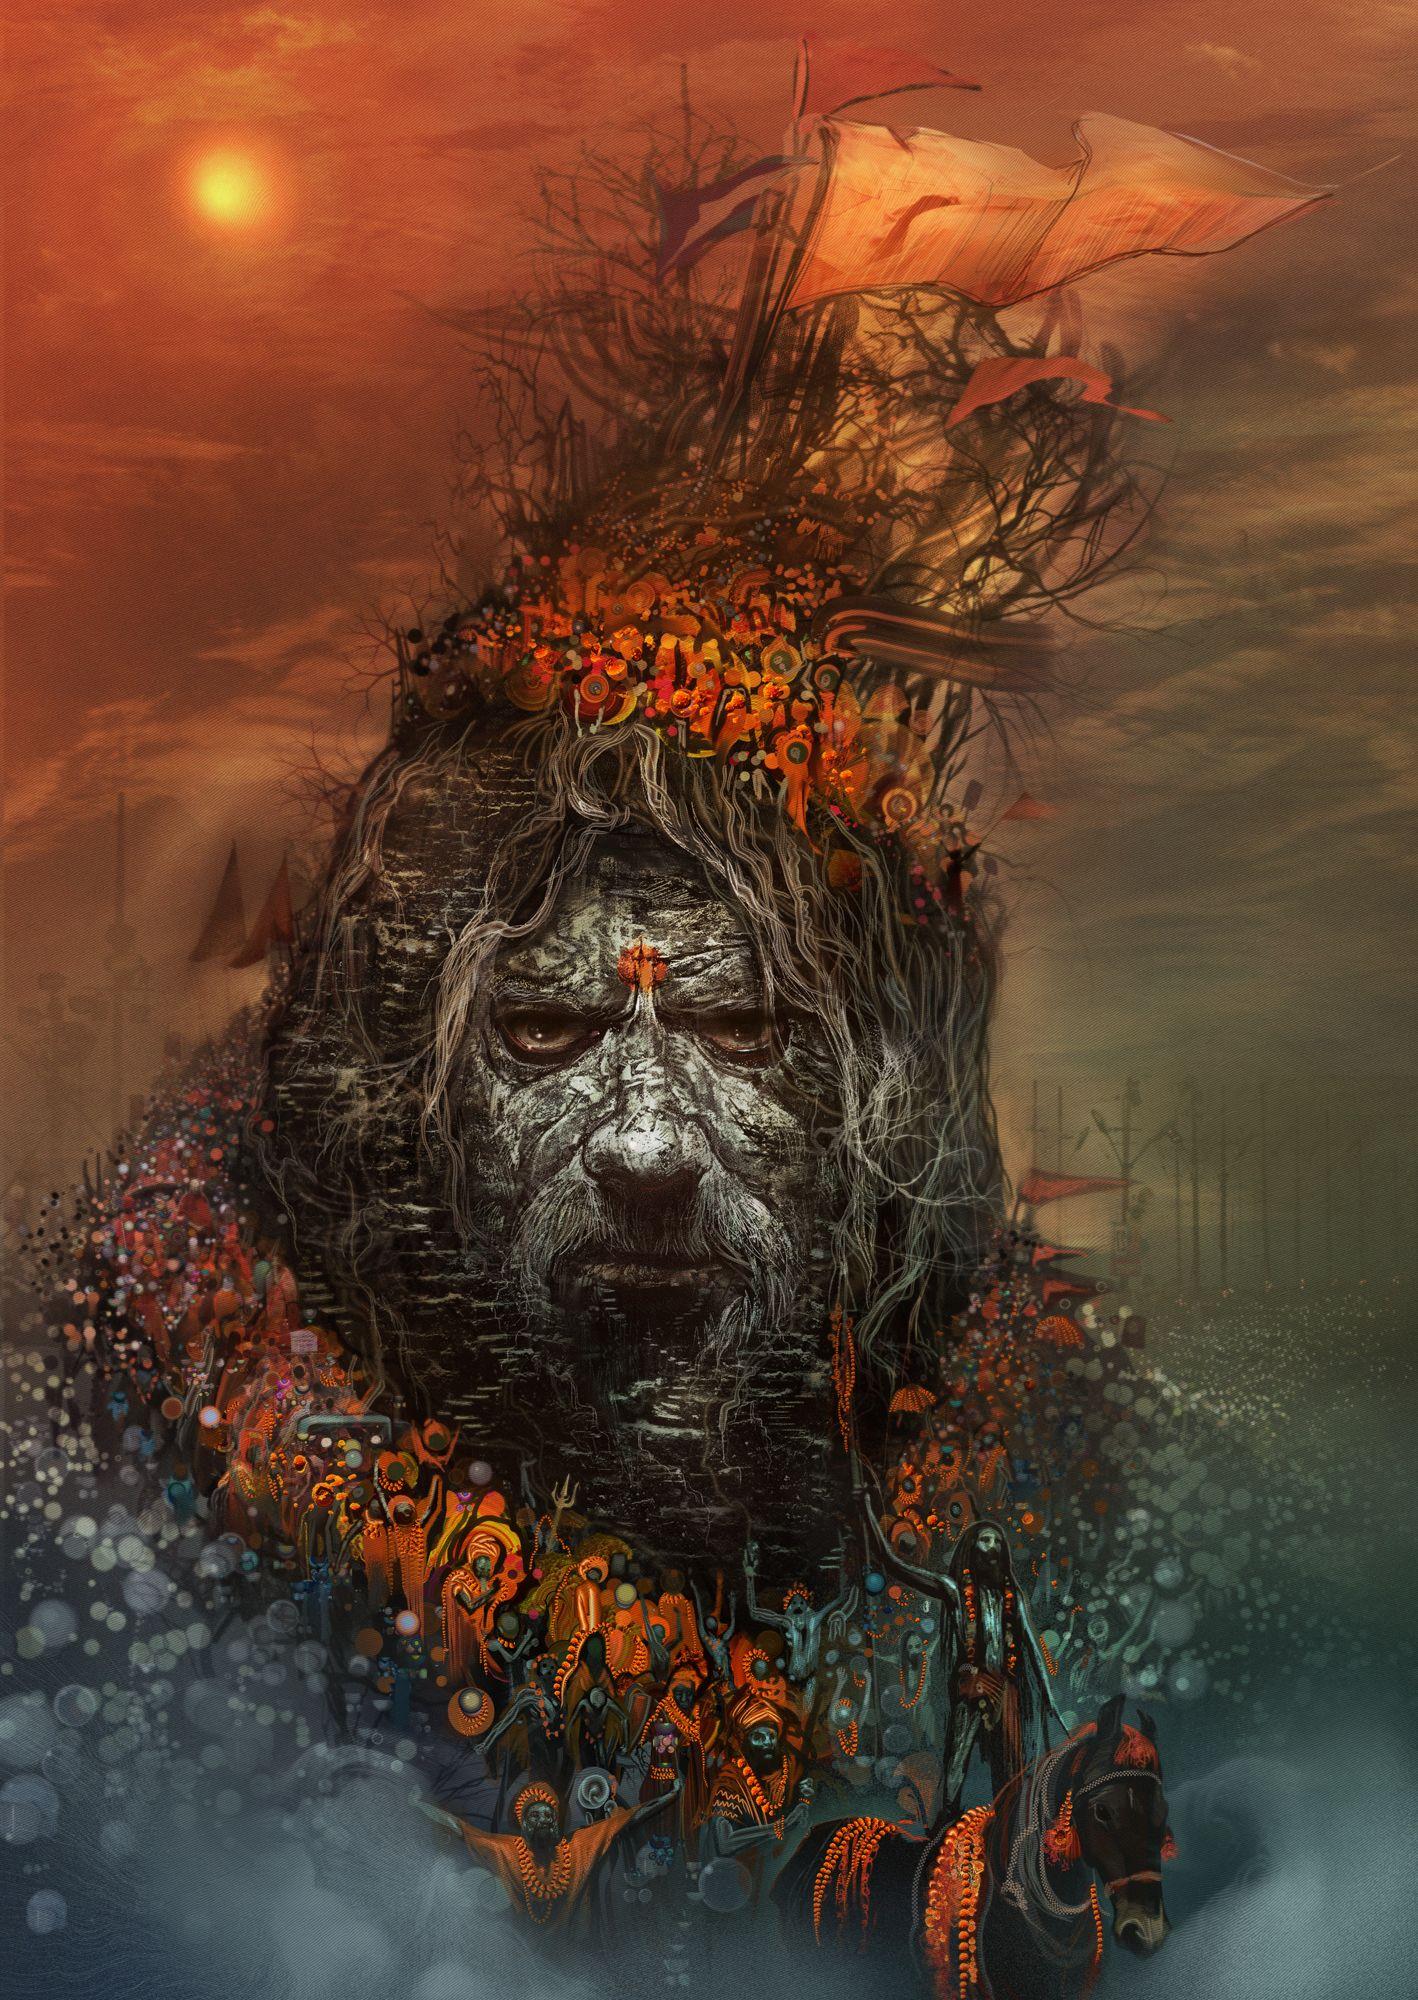 Illustration Android jones, Shiva art, Shiva lord wallpapers